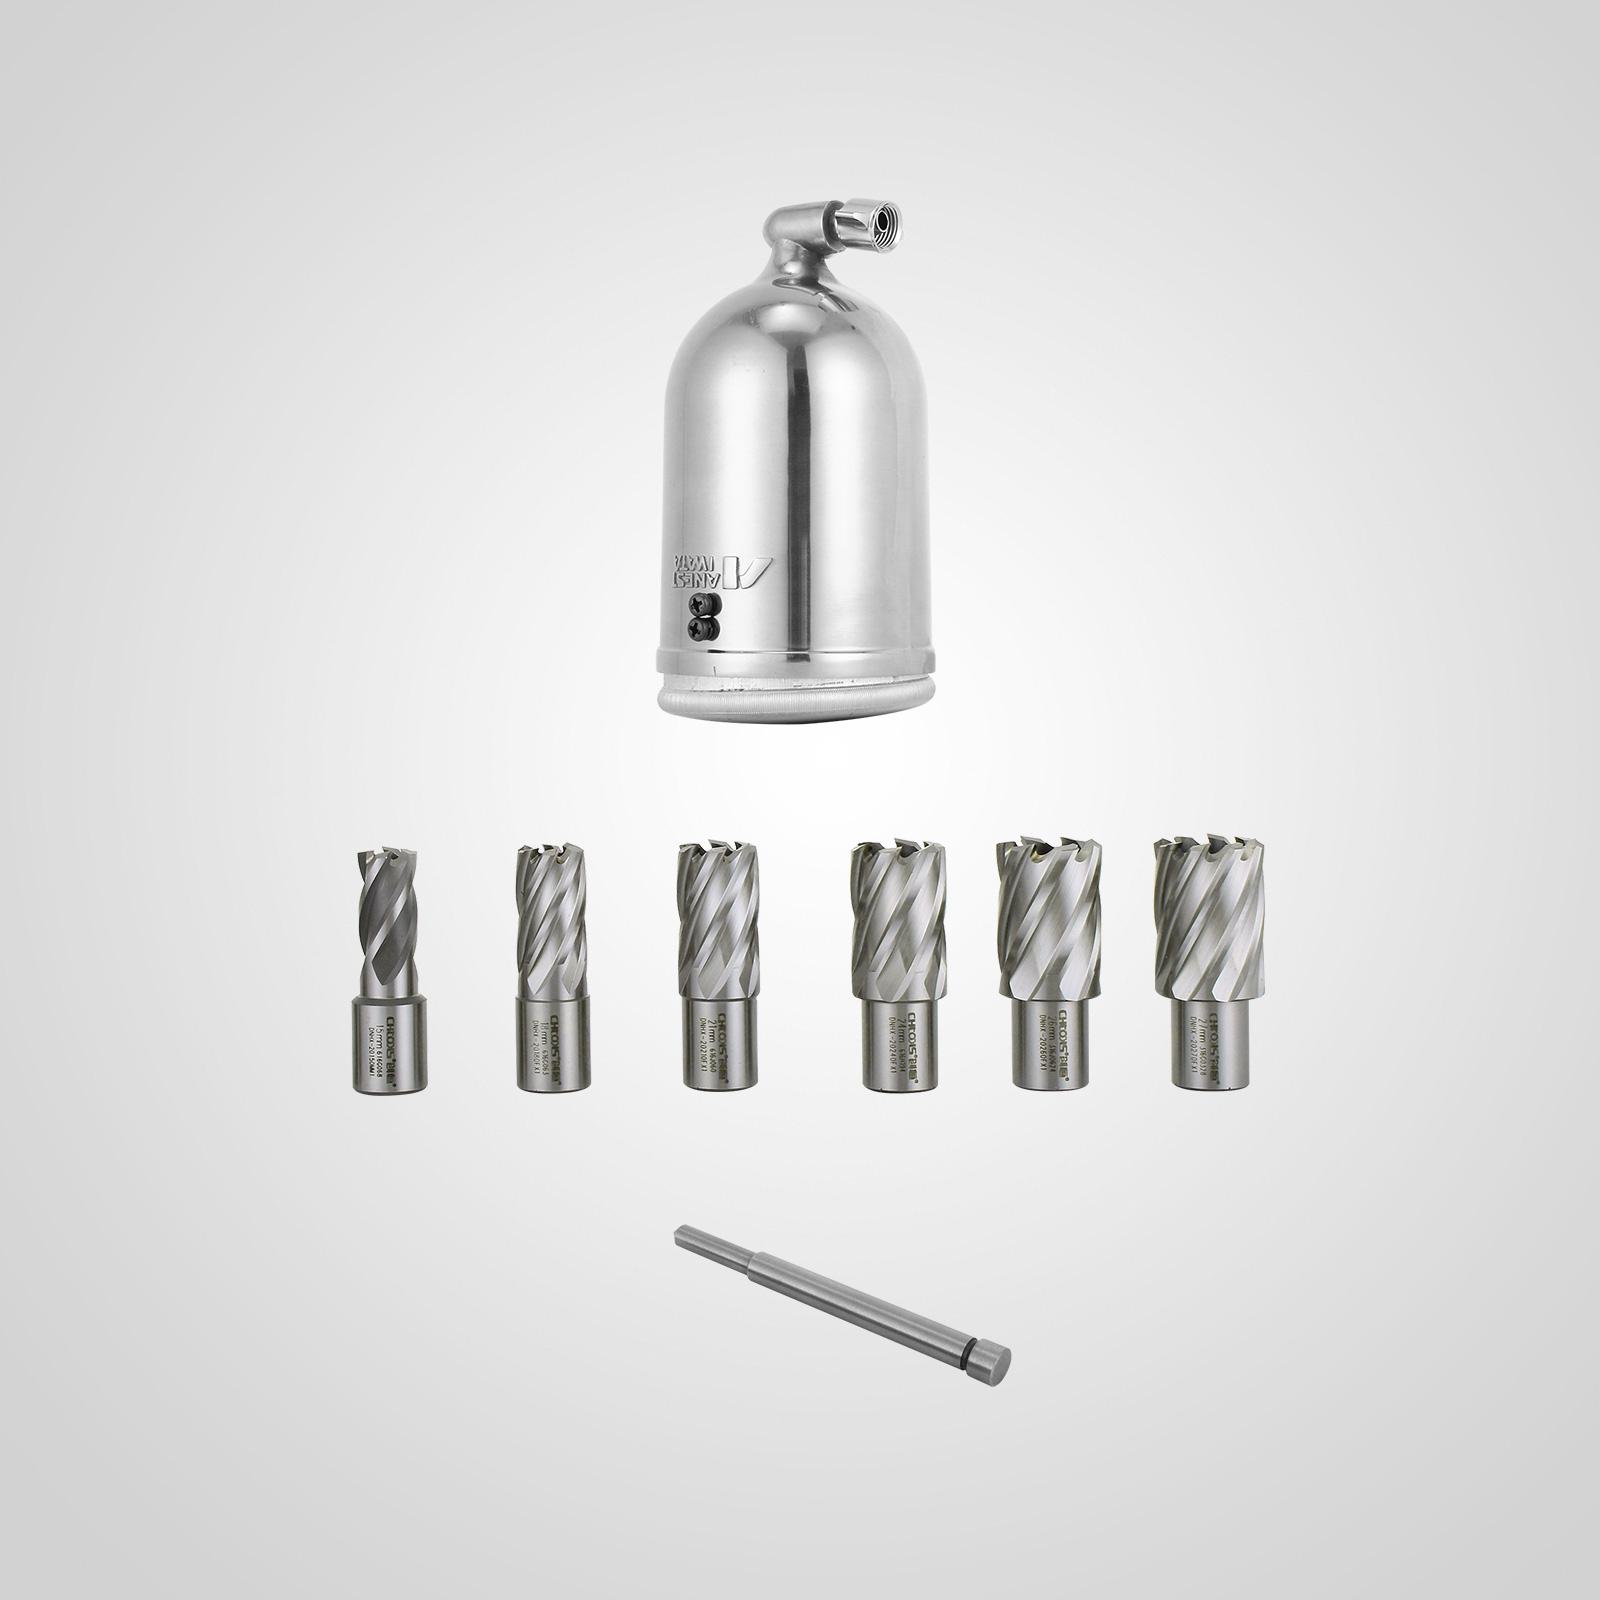 MB23-BRM35-MD40-Trapano-Perforatrice-Carotatore-Fresa-Magnetico-12-40mm-230V miniatura 36